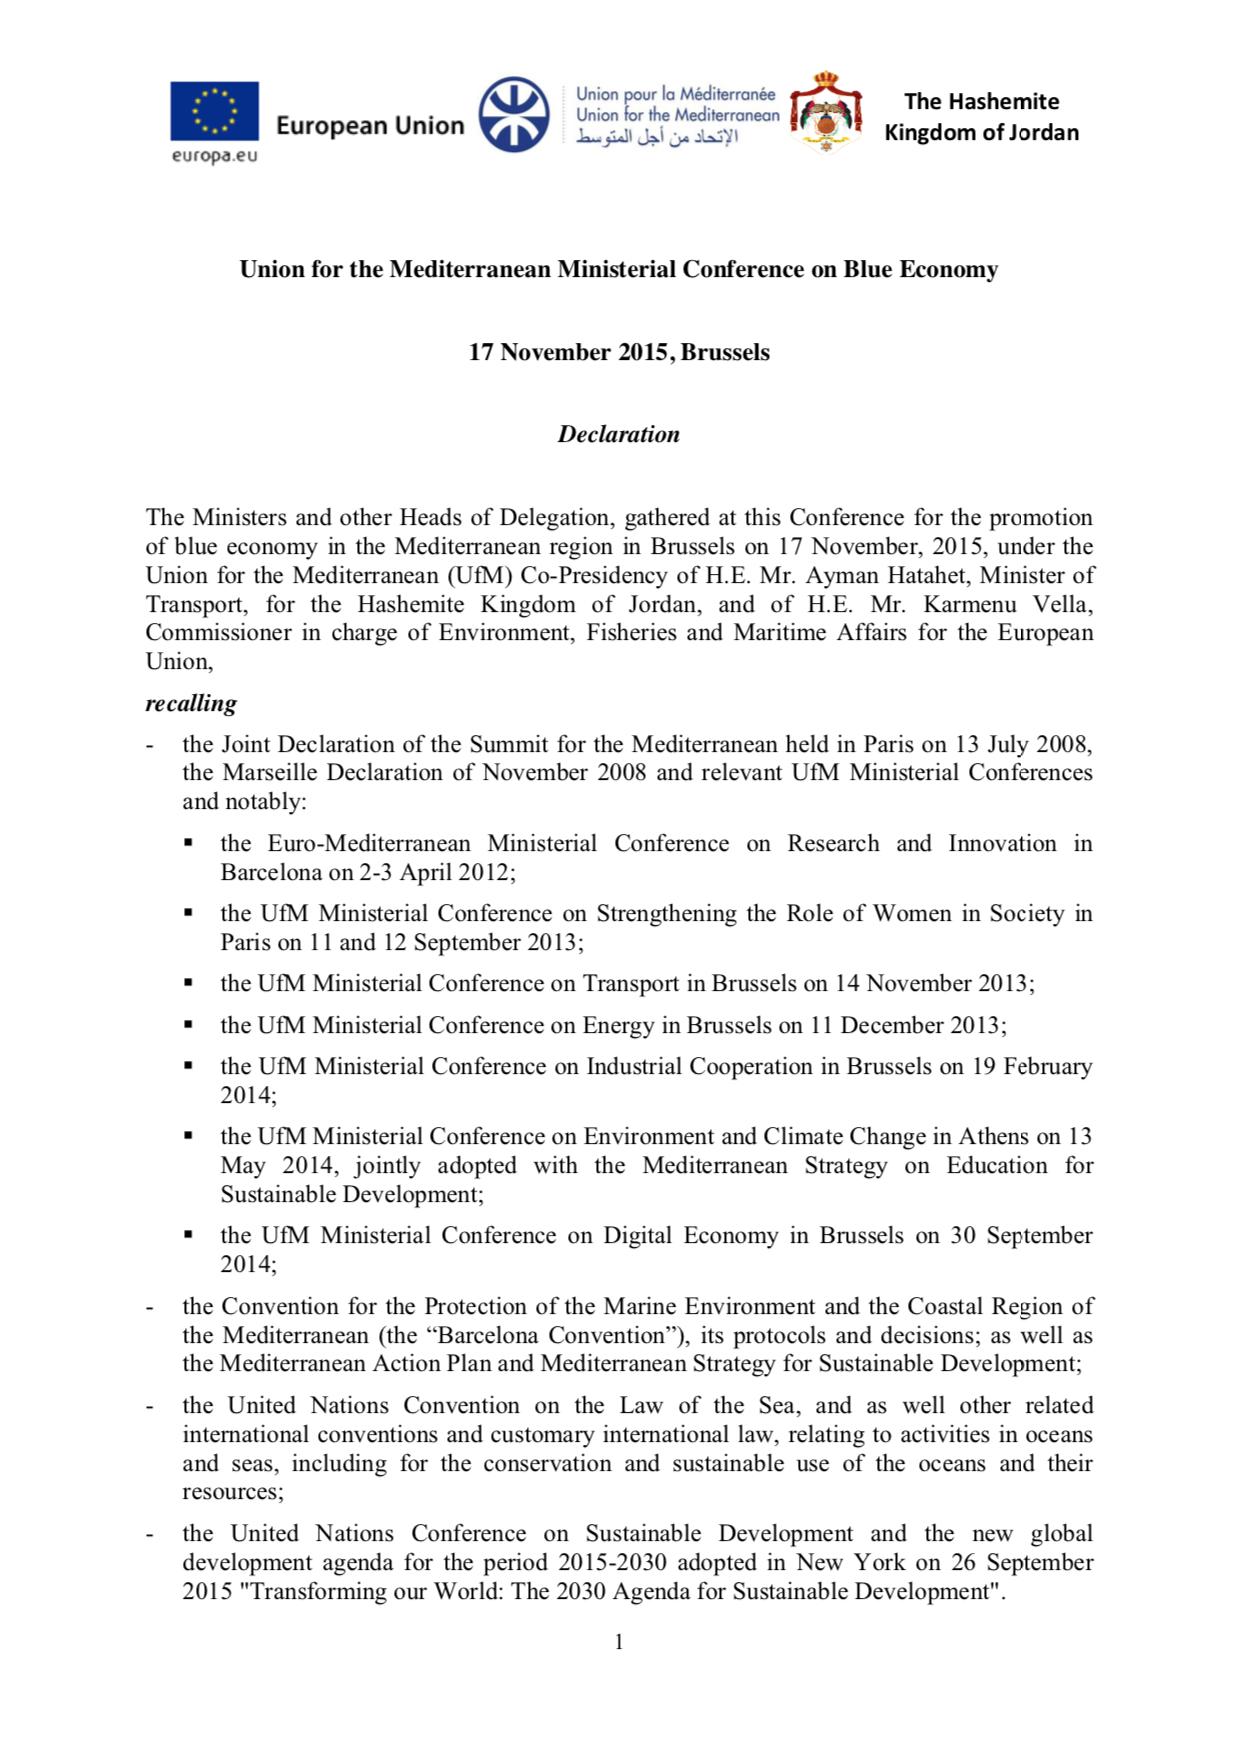 Blue Economy Declaration November 2015